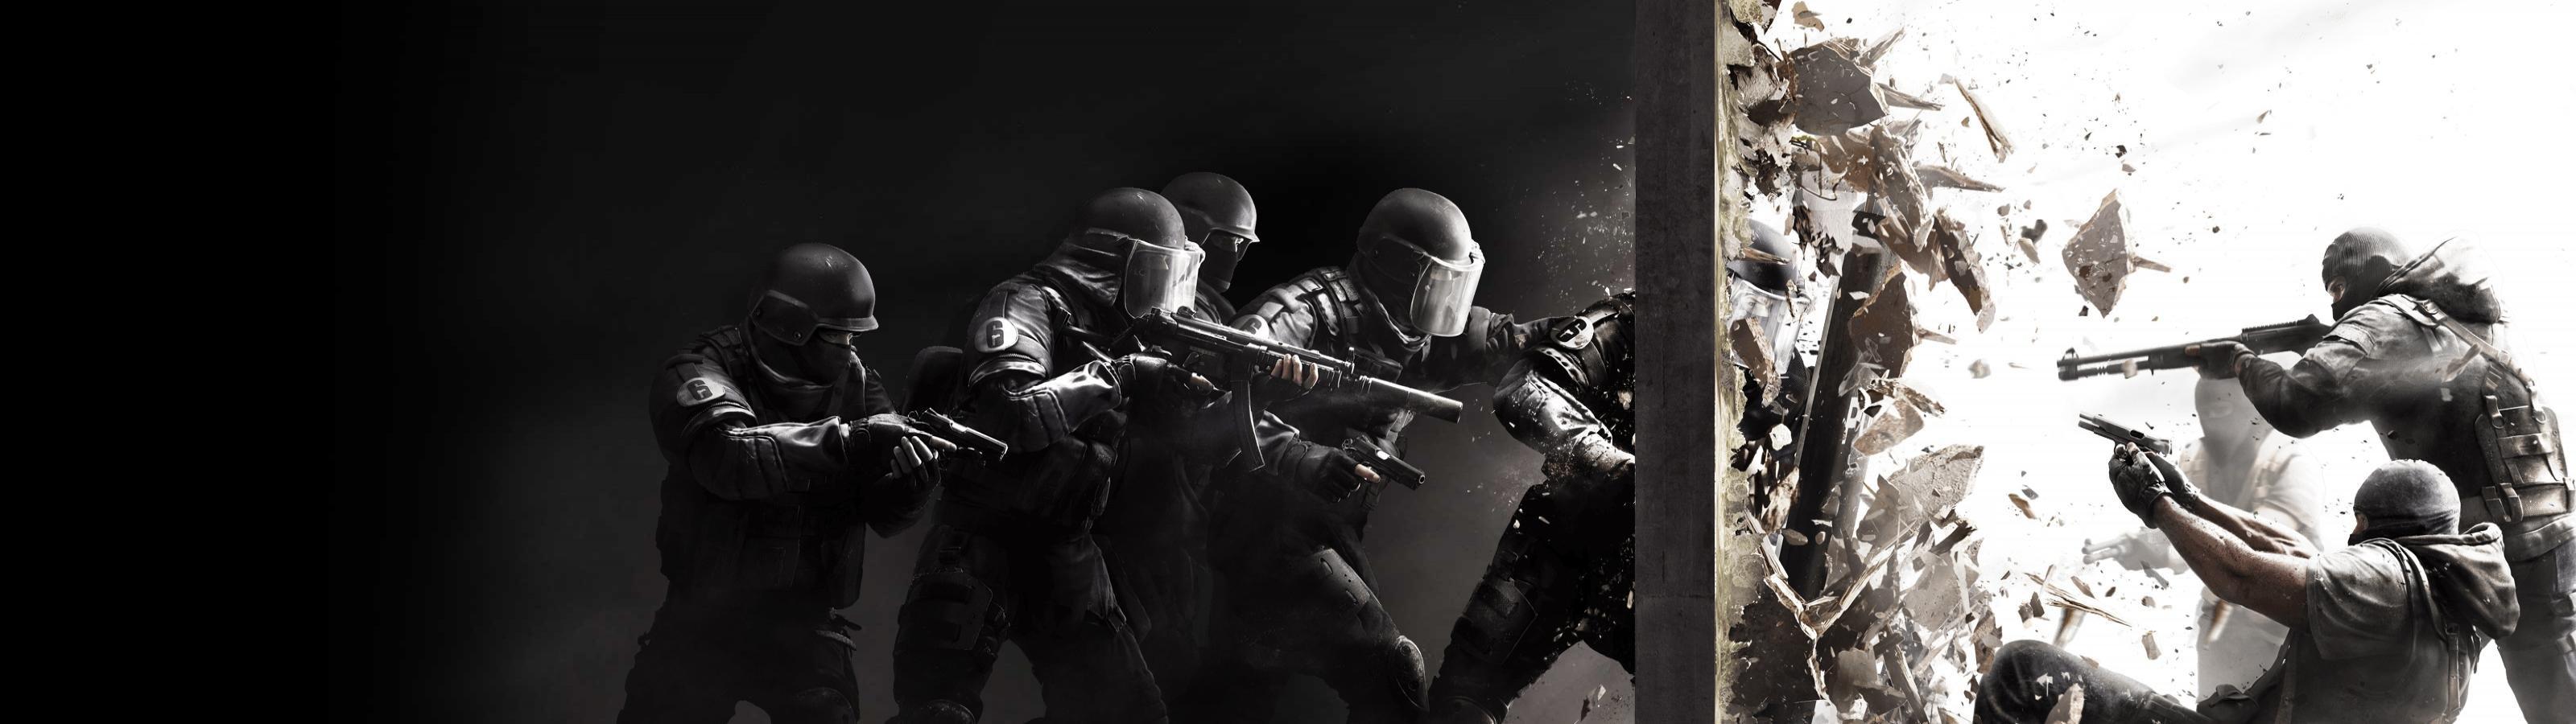 Download Dual Monitor Tom Clancy S Rainbow Six Rainbow 6 Siege